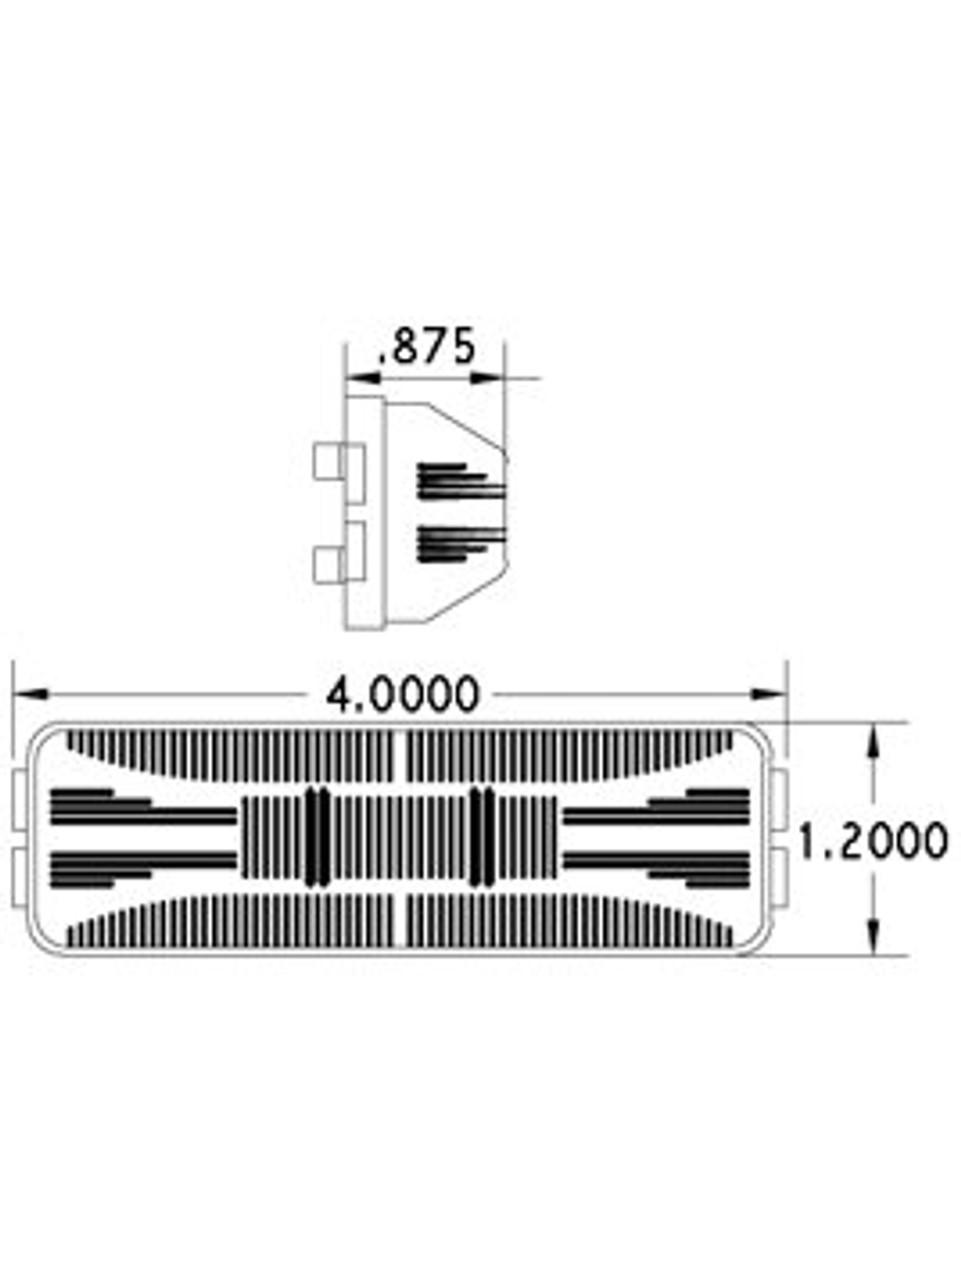 LED154A4 --- Rectangular Sealed LED Clearance/Side Marker Light - 4 Diodes